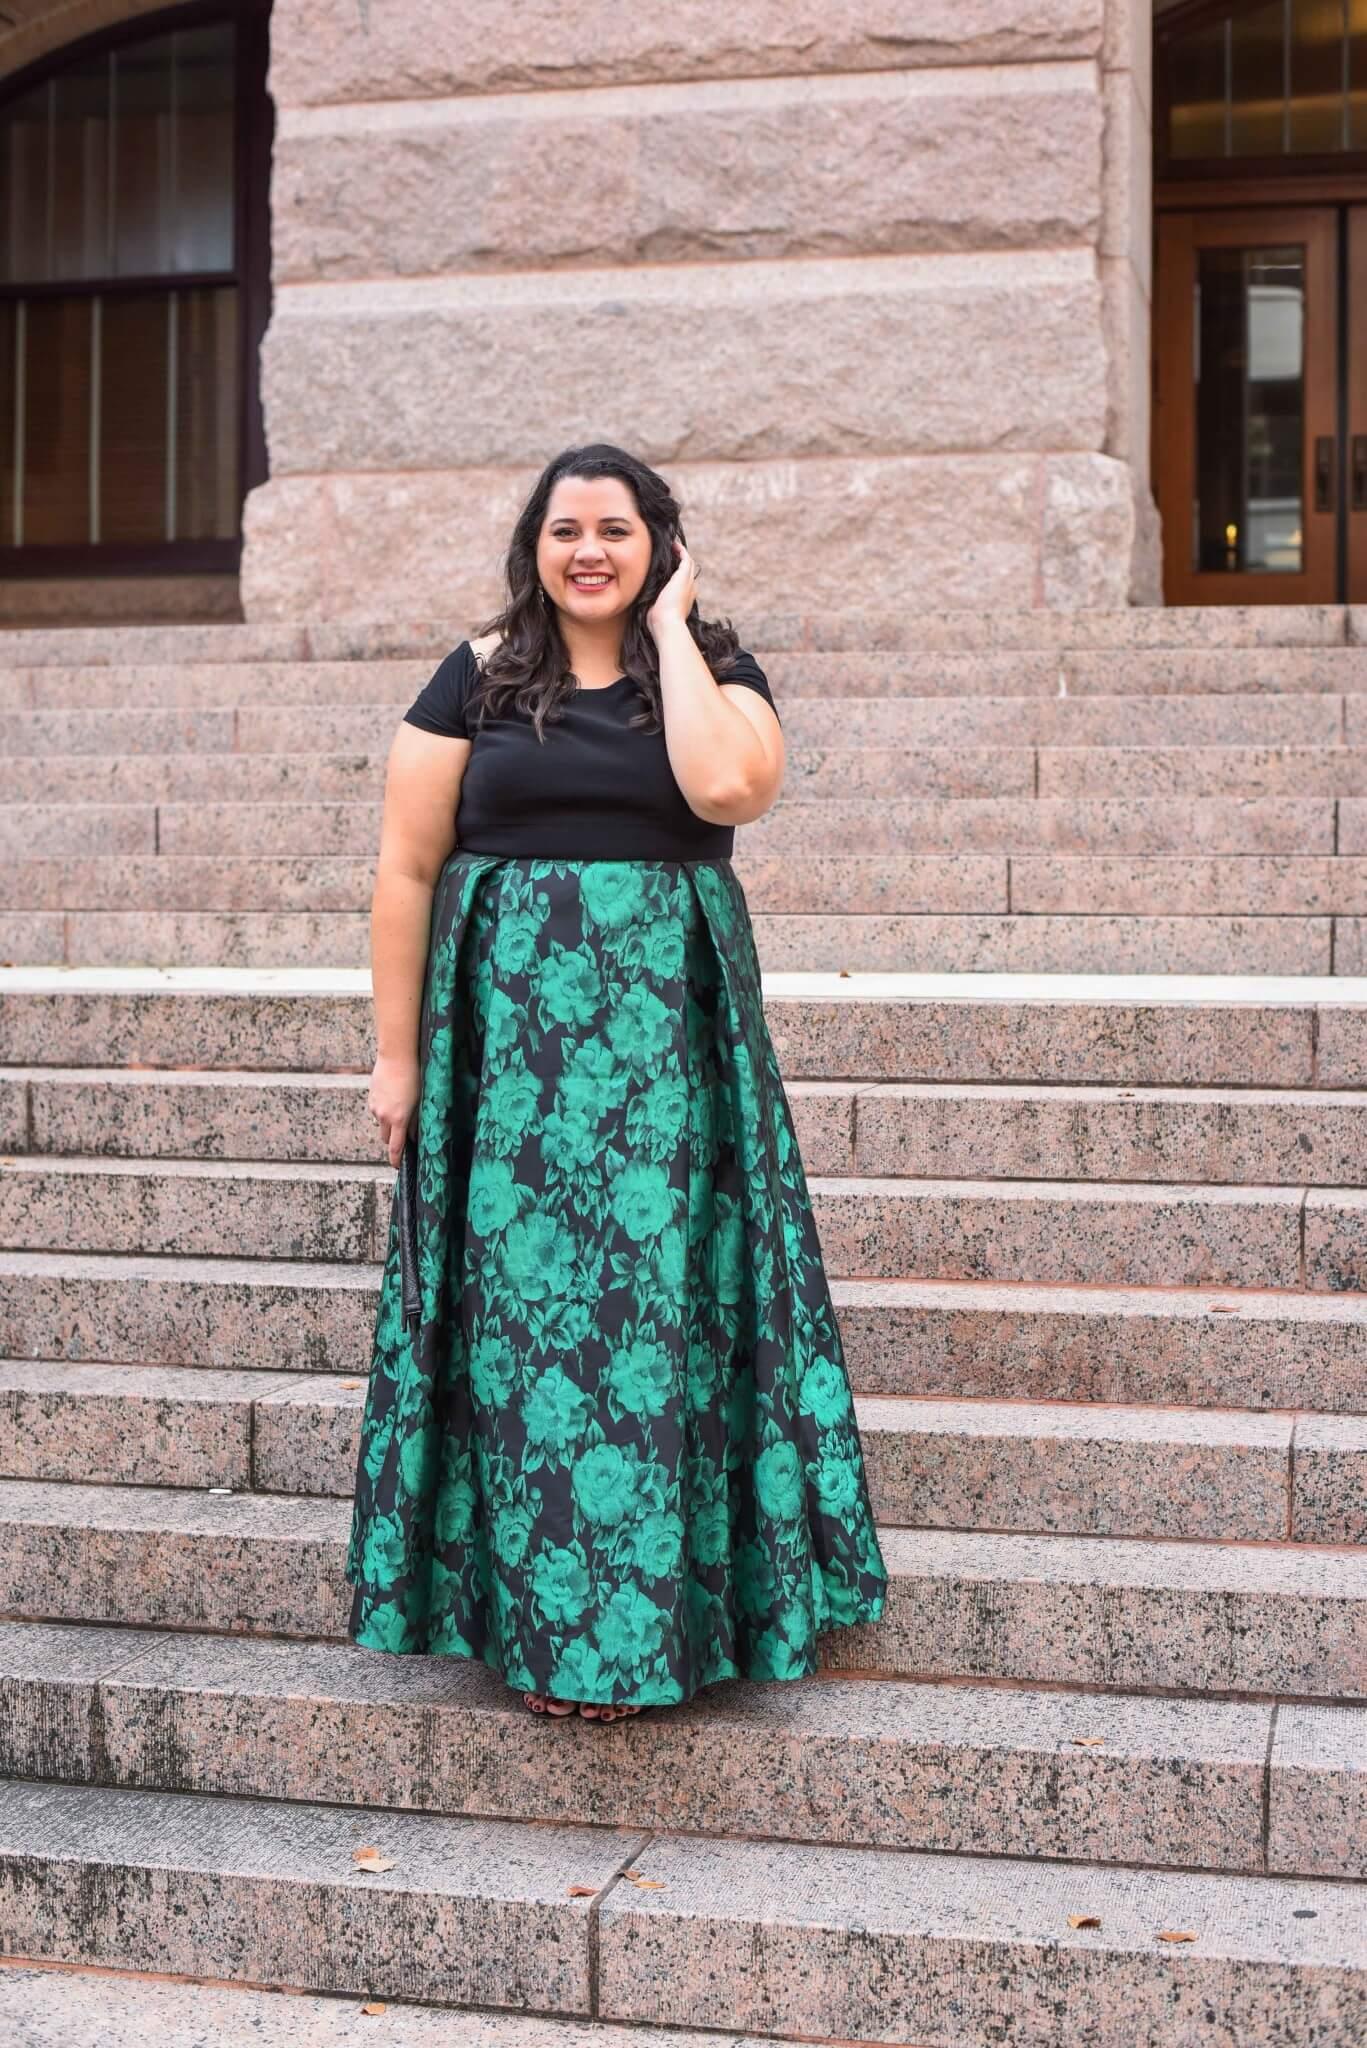 Best Outfit For A Winter Wedding Gallery - Wedding Ideas - memiocall.com